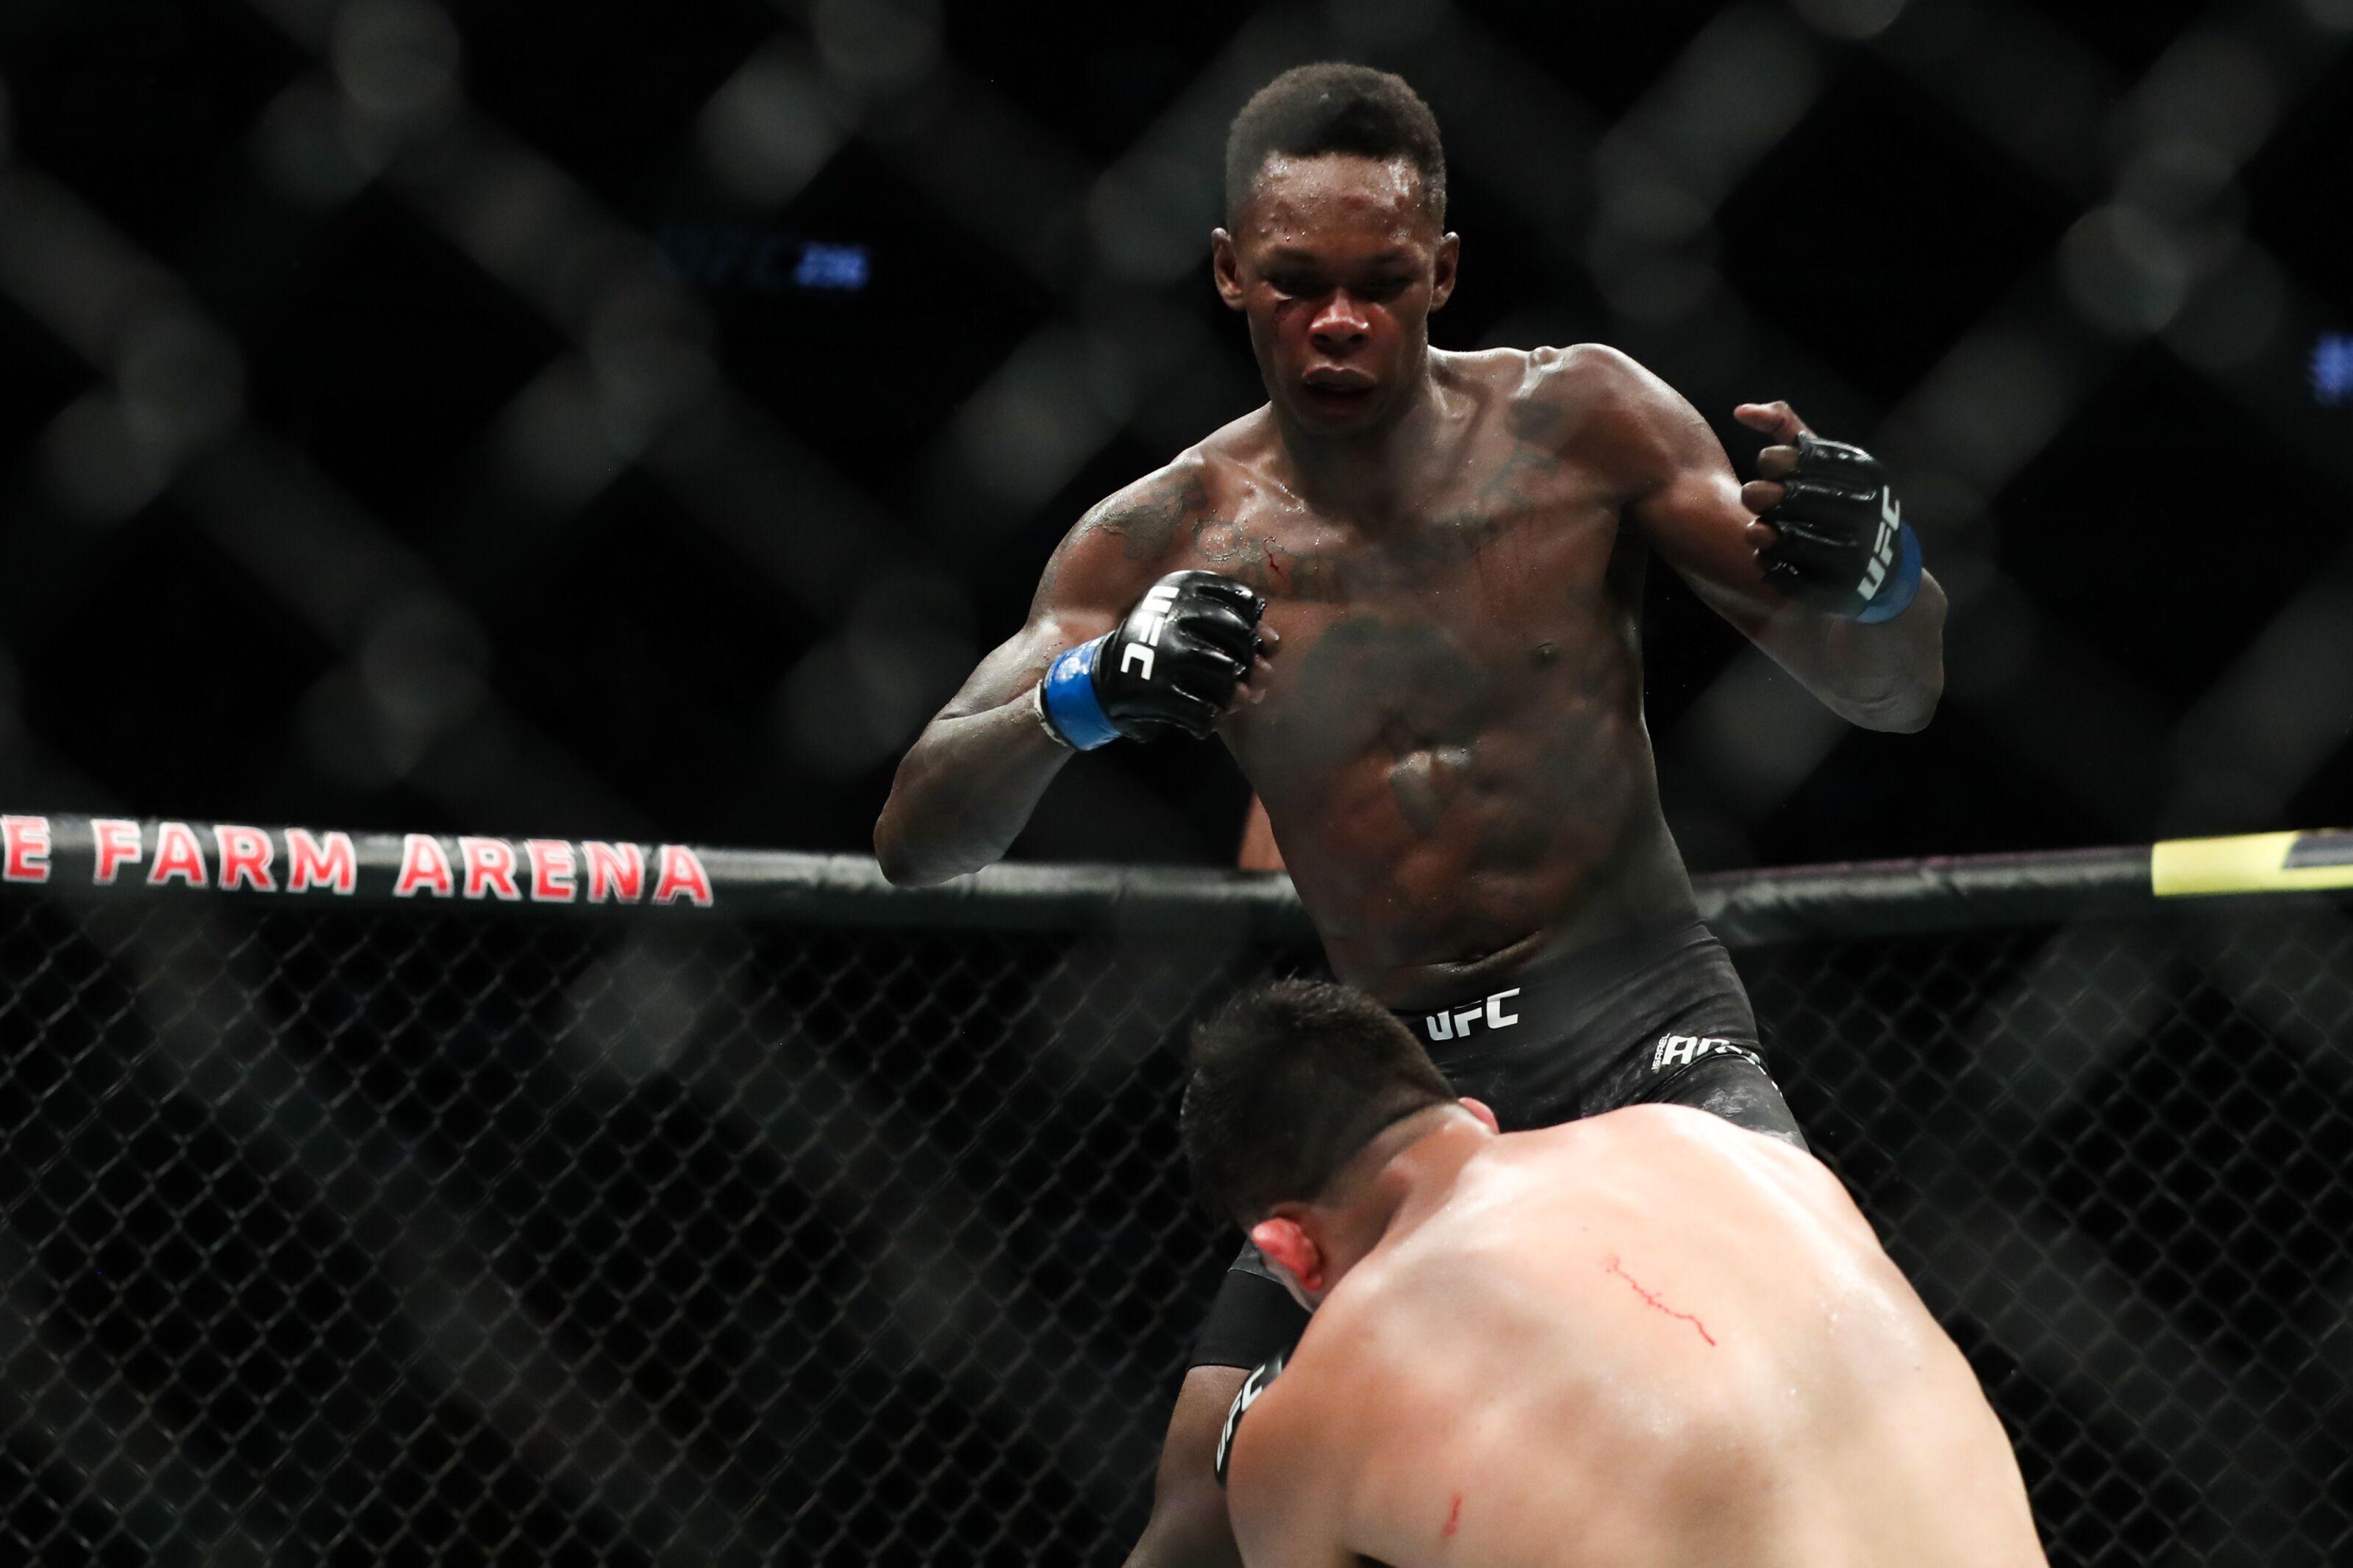 c5ae4fea212 UFC 236: Twitter reacts to Kelvin Gastelum vs. Israel Adesanya